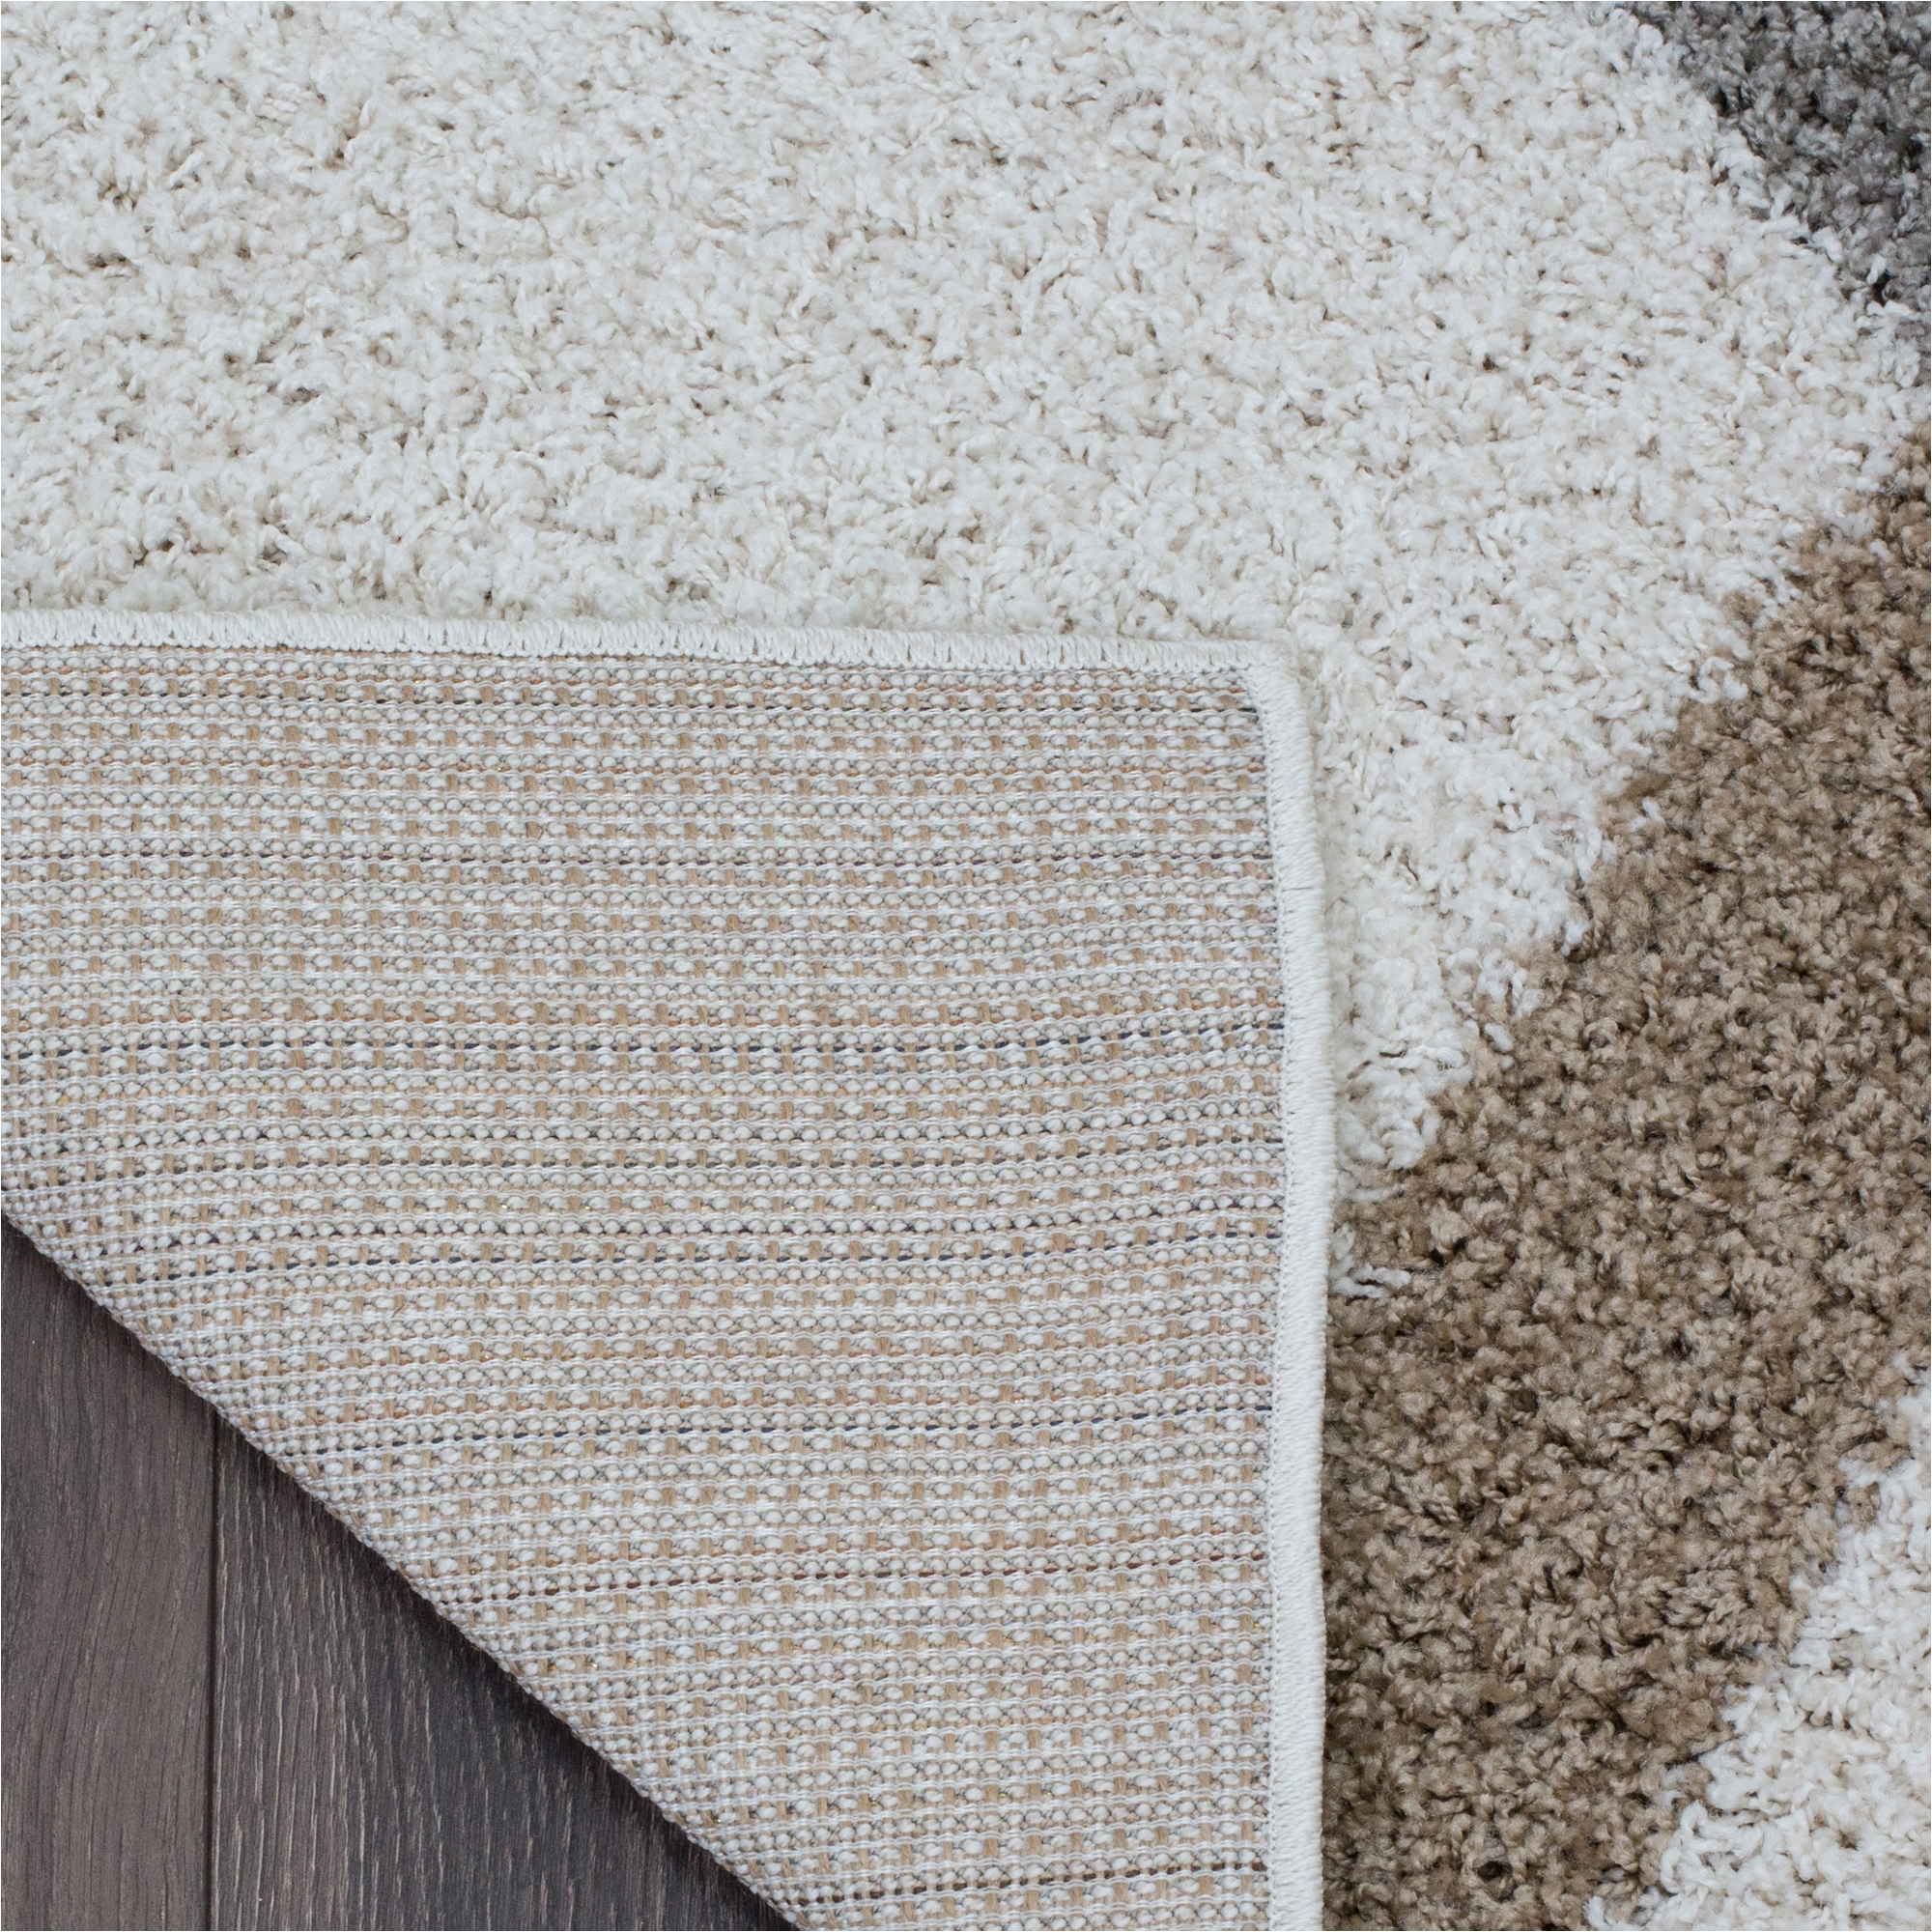 affordable nicole miller designer area rug white beige geometric swirls carpet shag rug with designer area rug